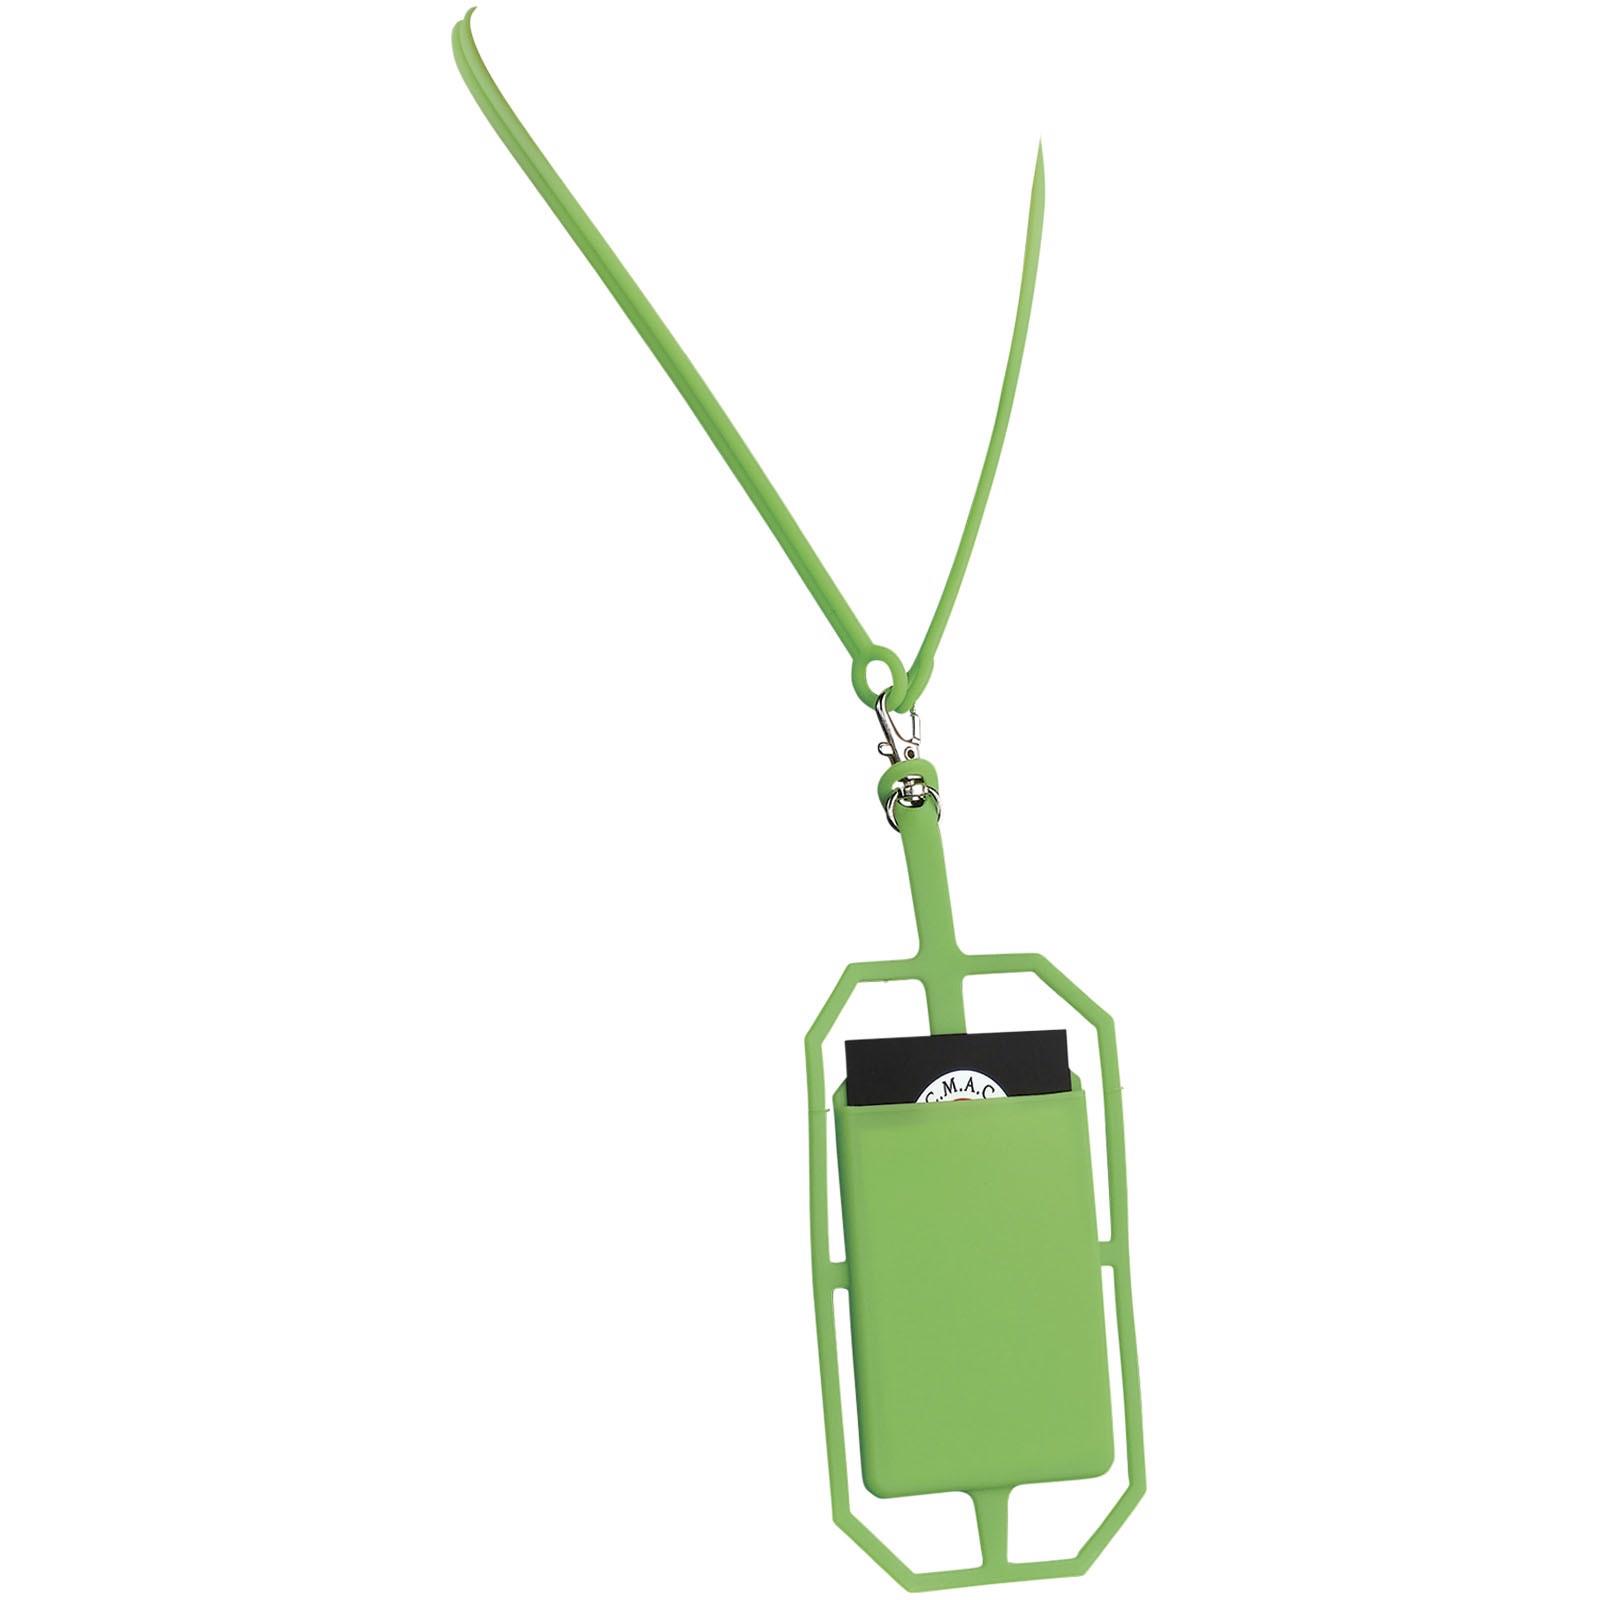 Silikonové pouzdro na kartu s RFID a lanyardem - Limetka